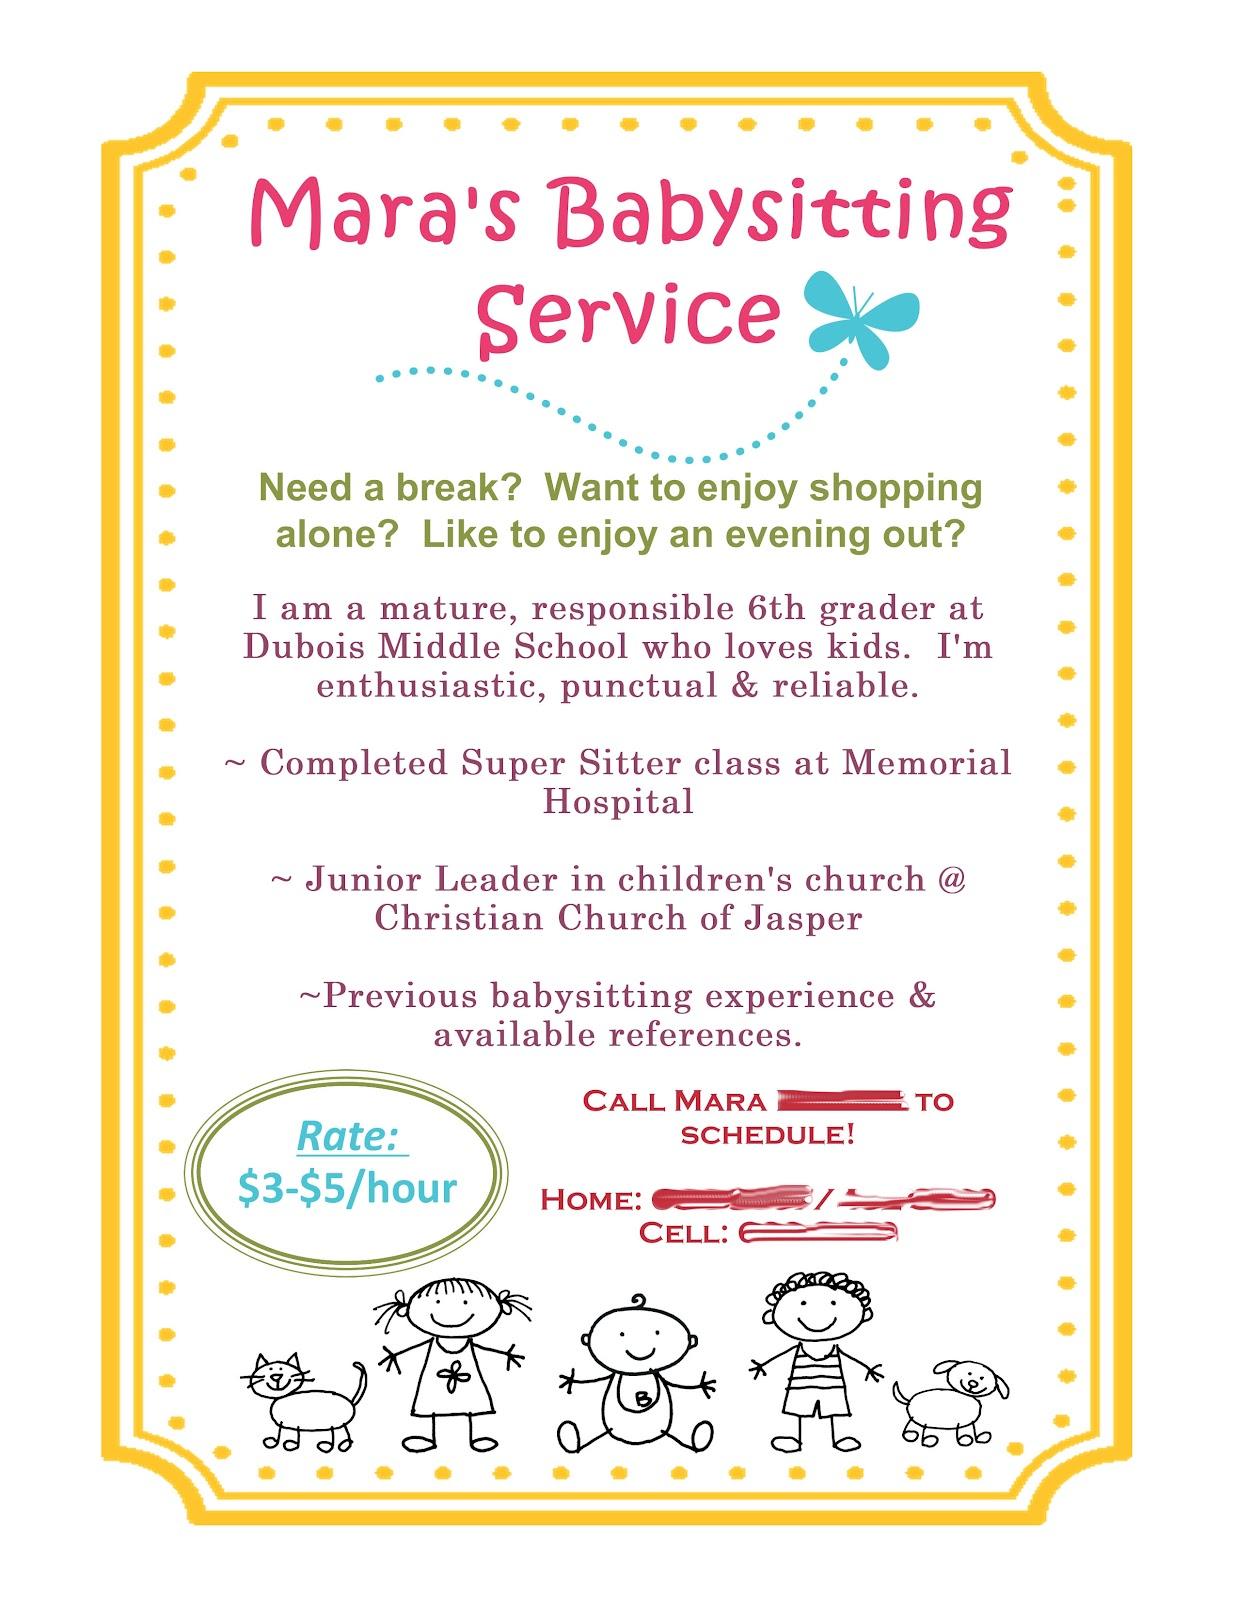 make a babysitting resume best resume and letter cv make a babysitting resume how to write a resume for babysitting pictures resume example babysitting